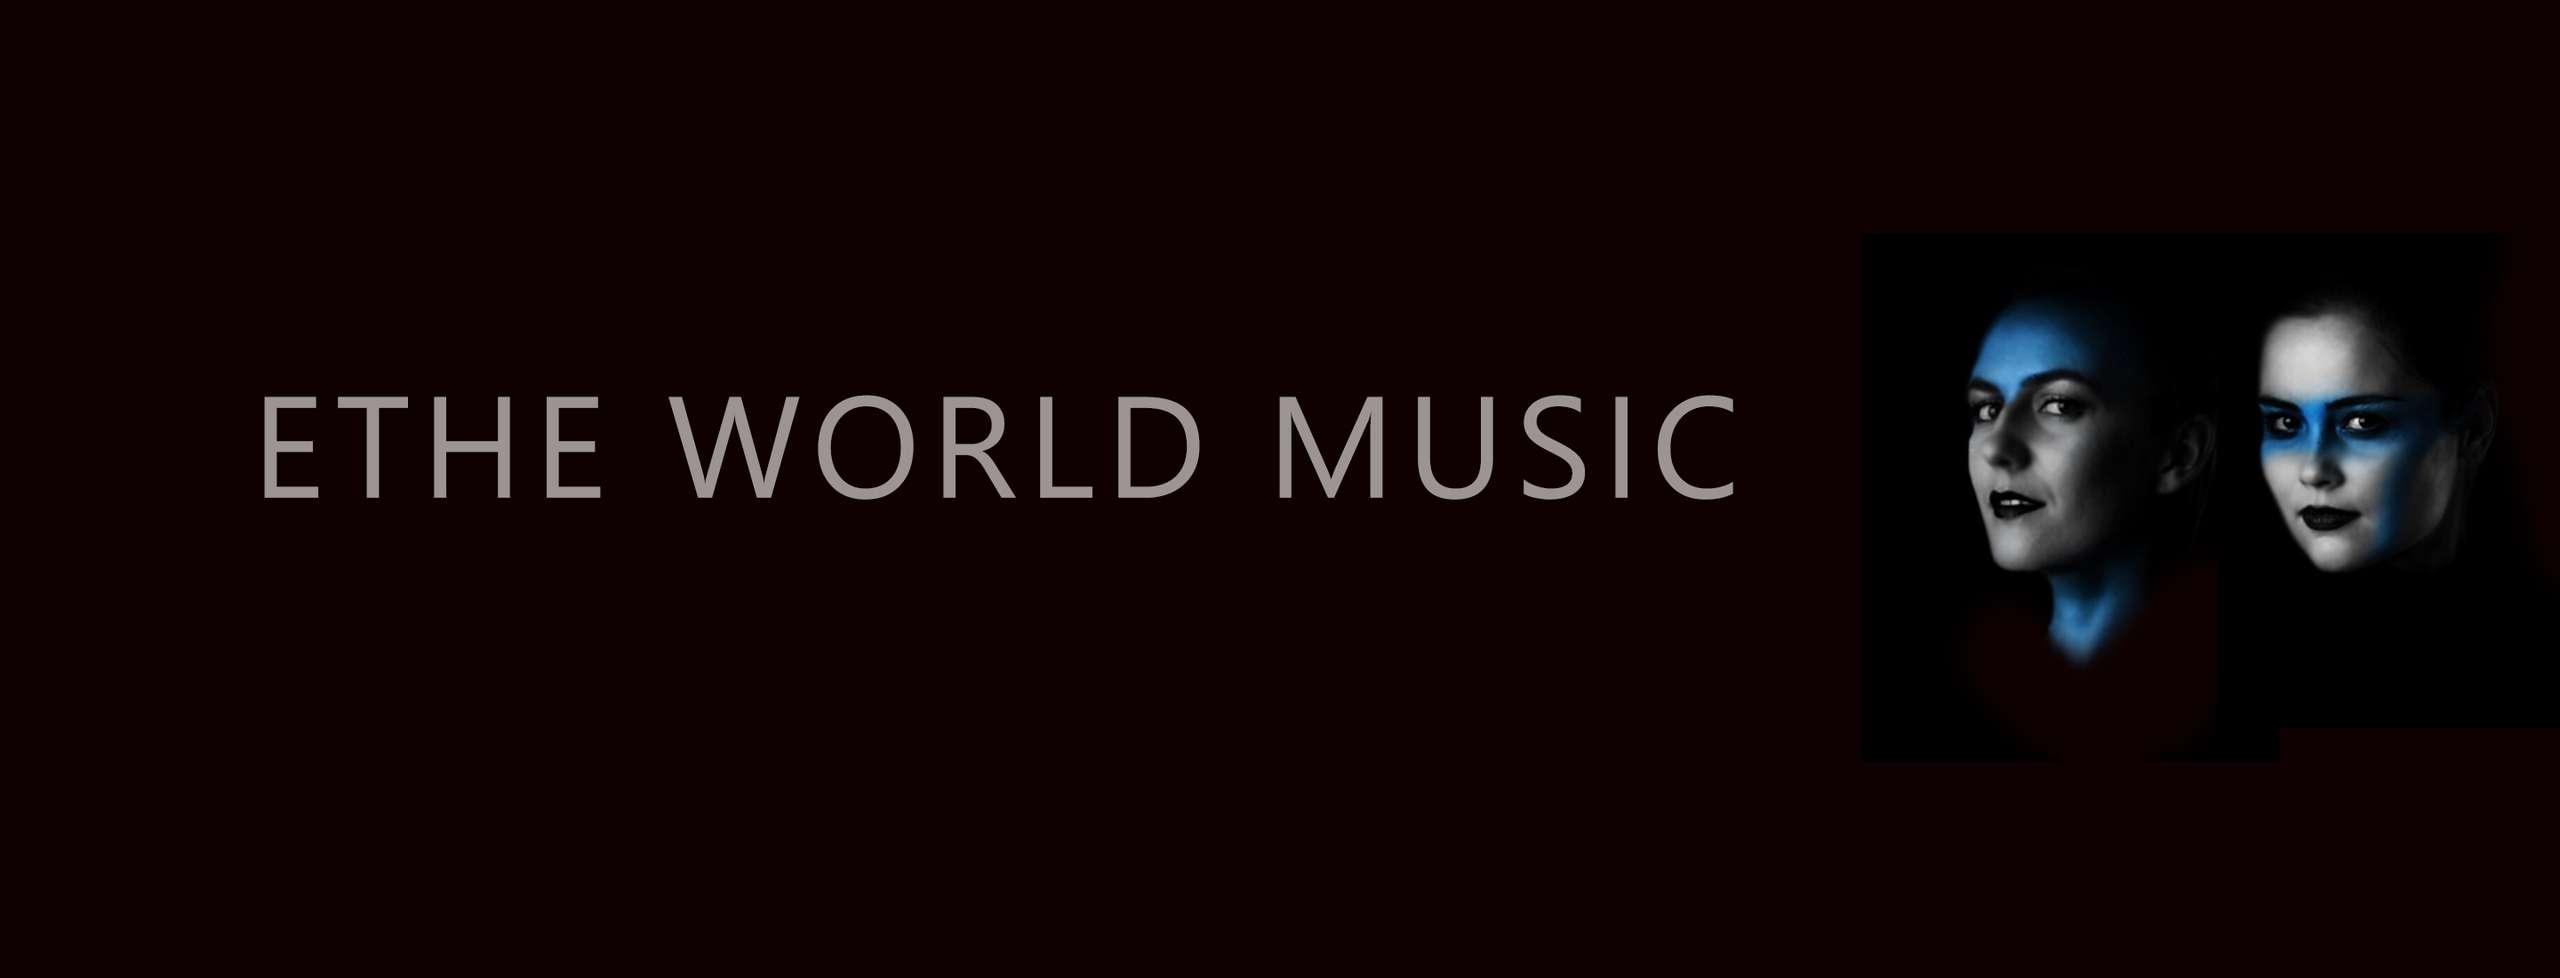 ETHE WORLD MUSIC